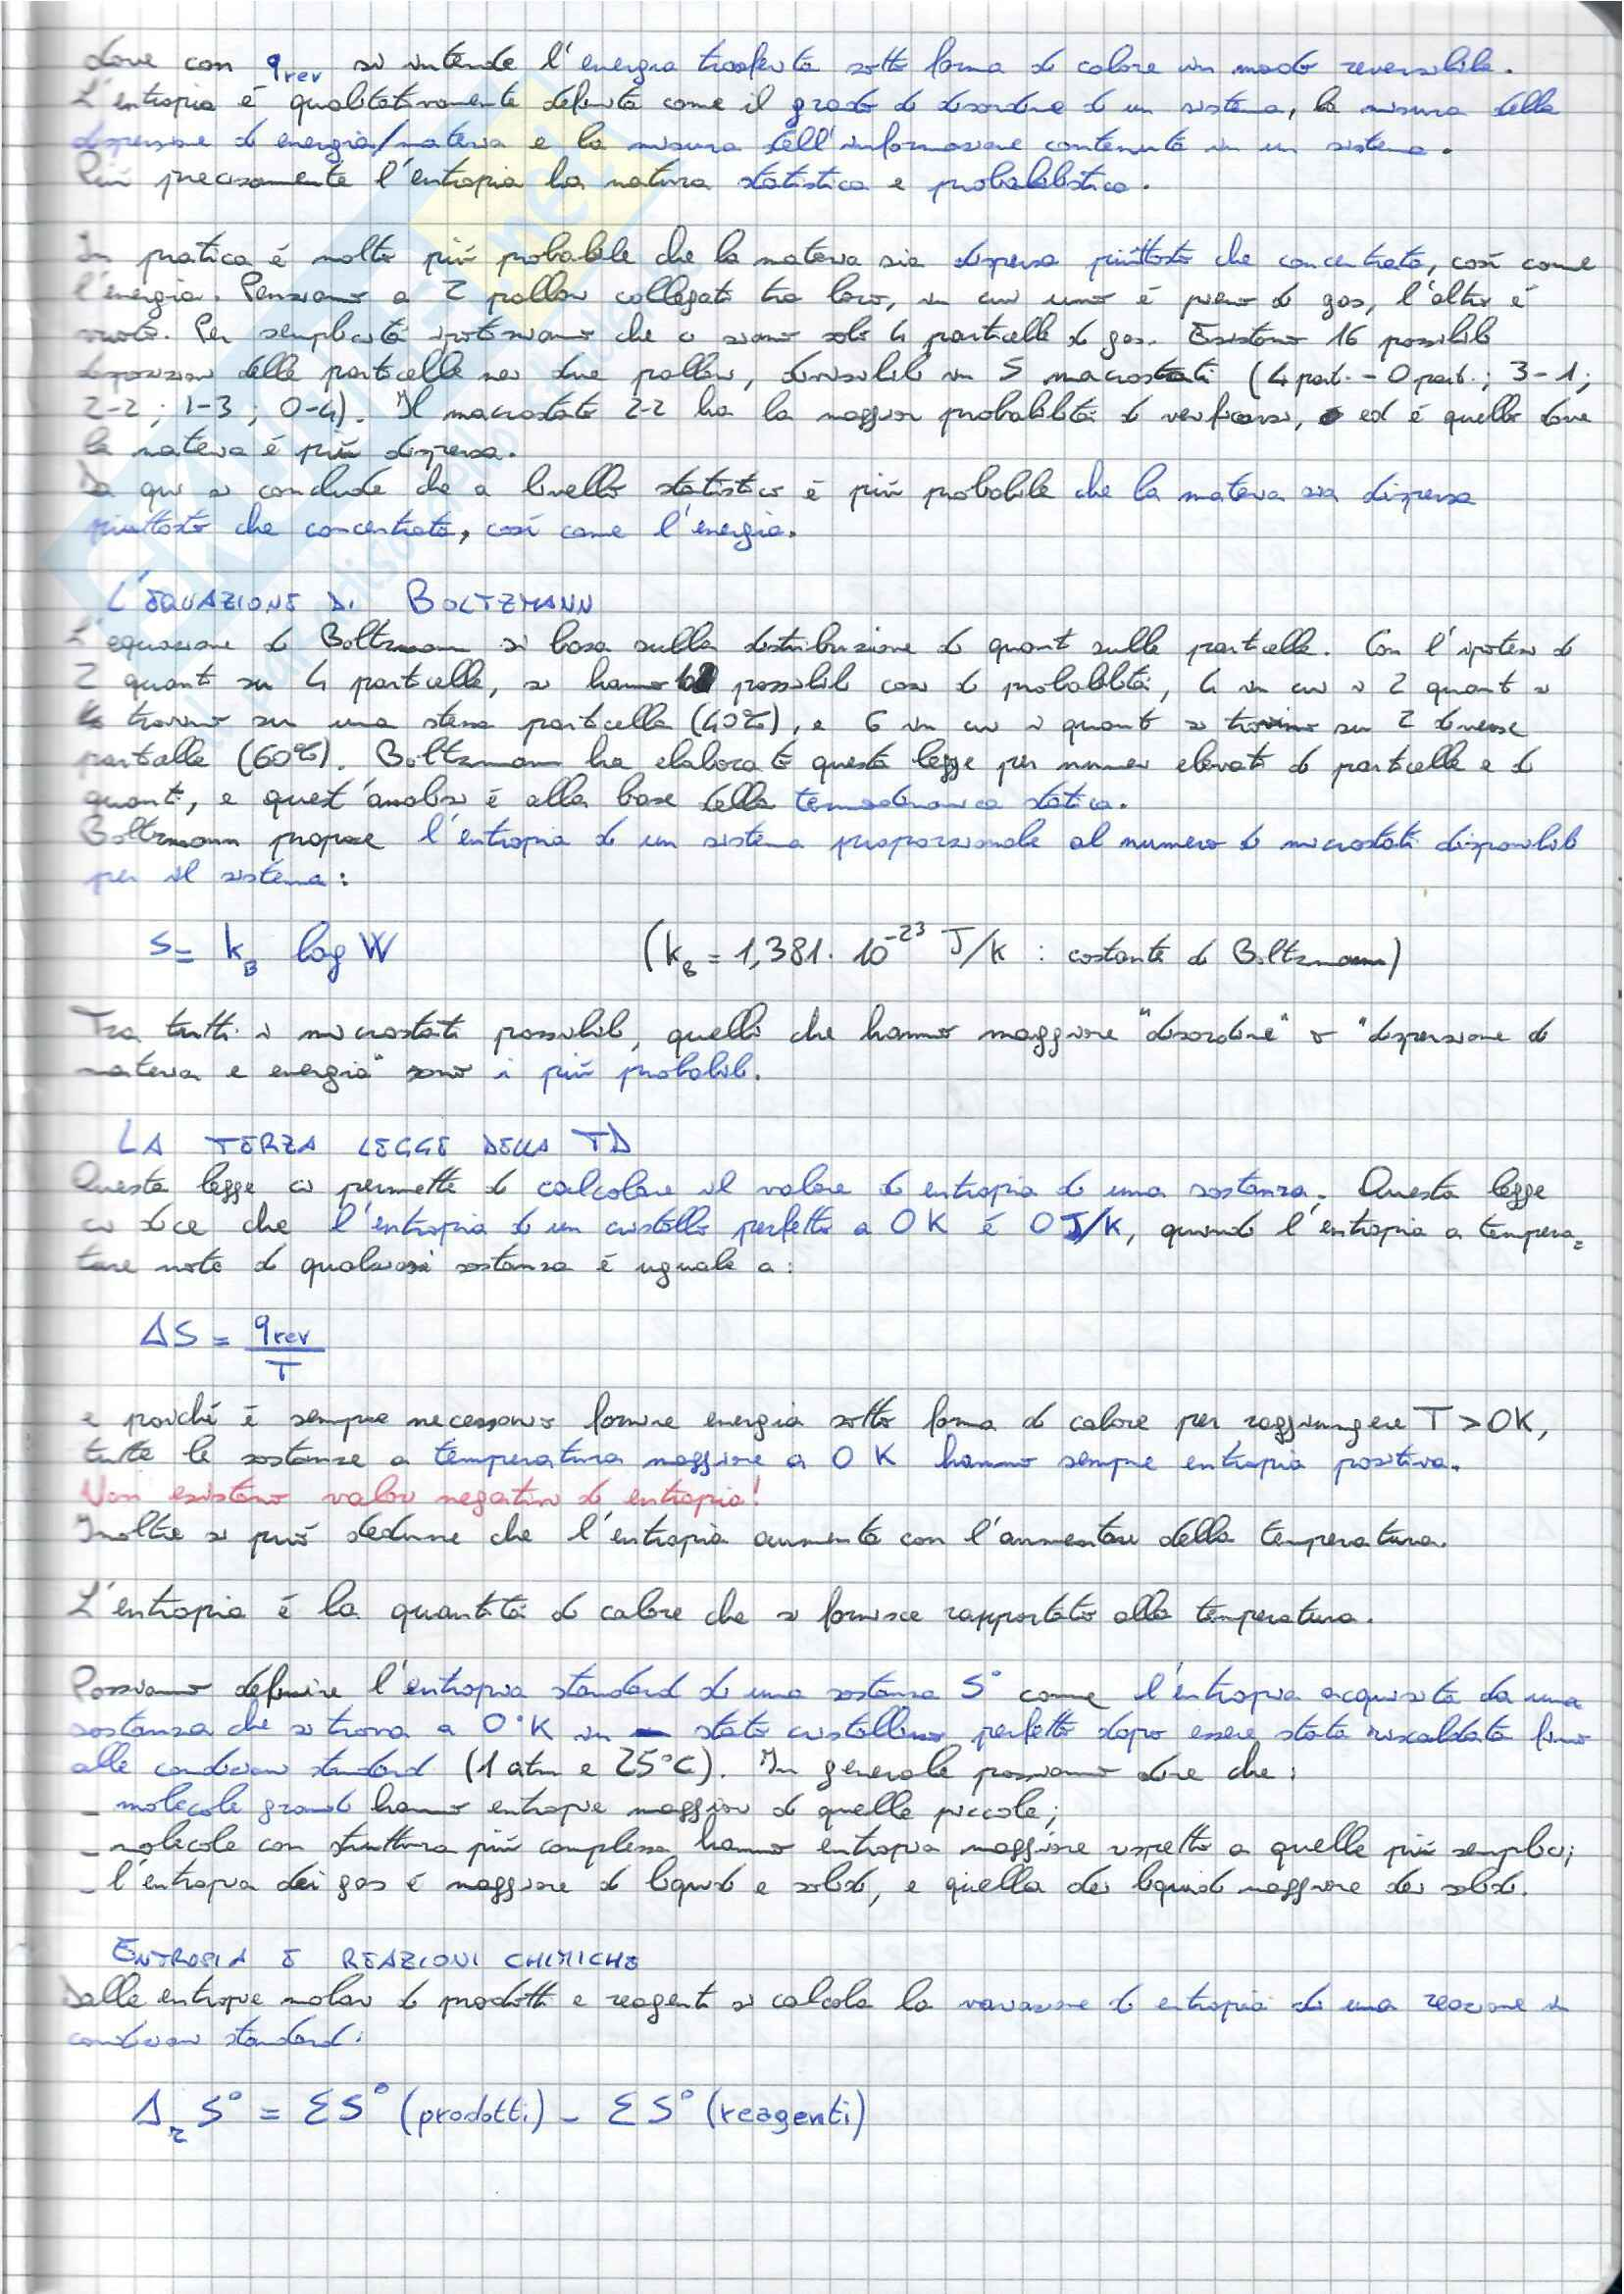 Riassunti Chimica Pag. 51